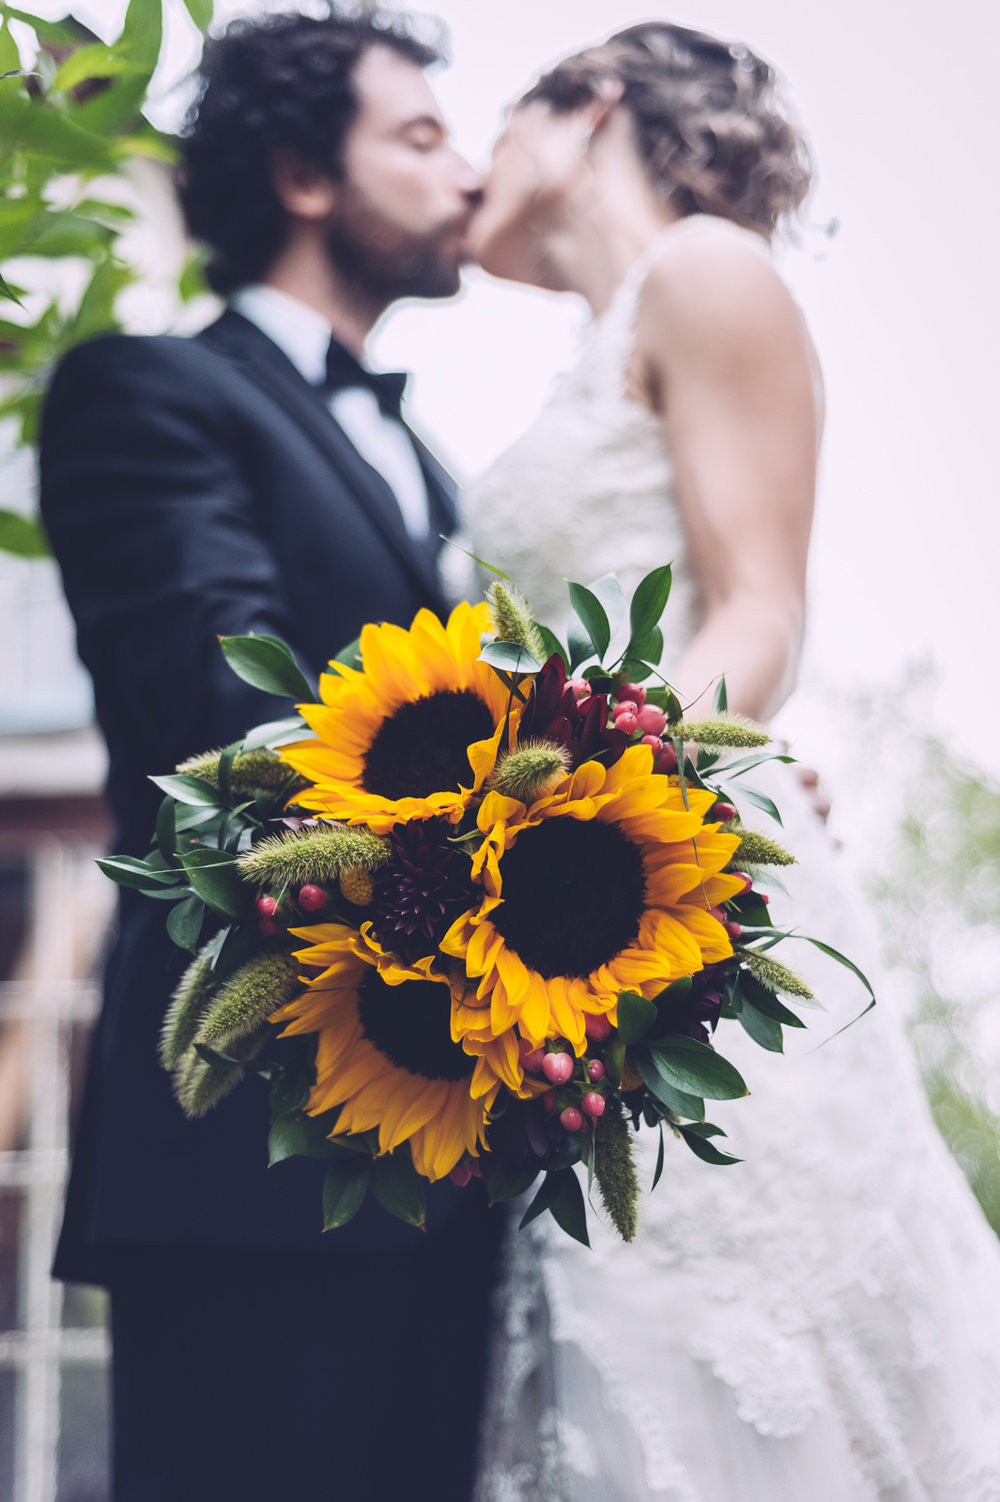 kendal_richard_wedding_blog24.jpg